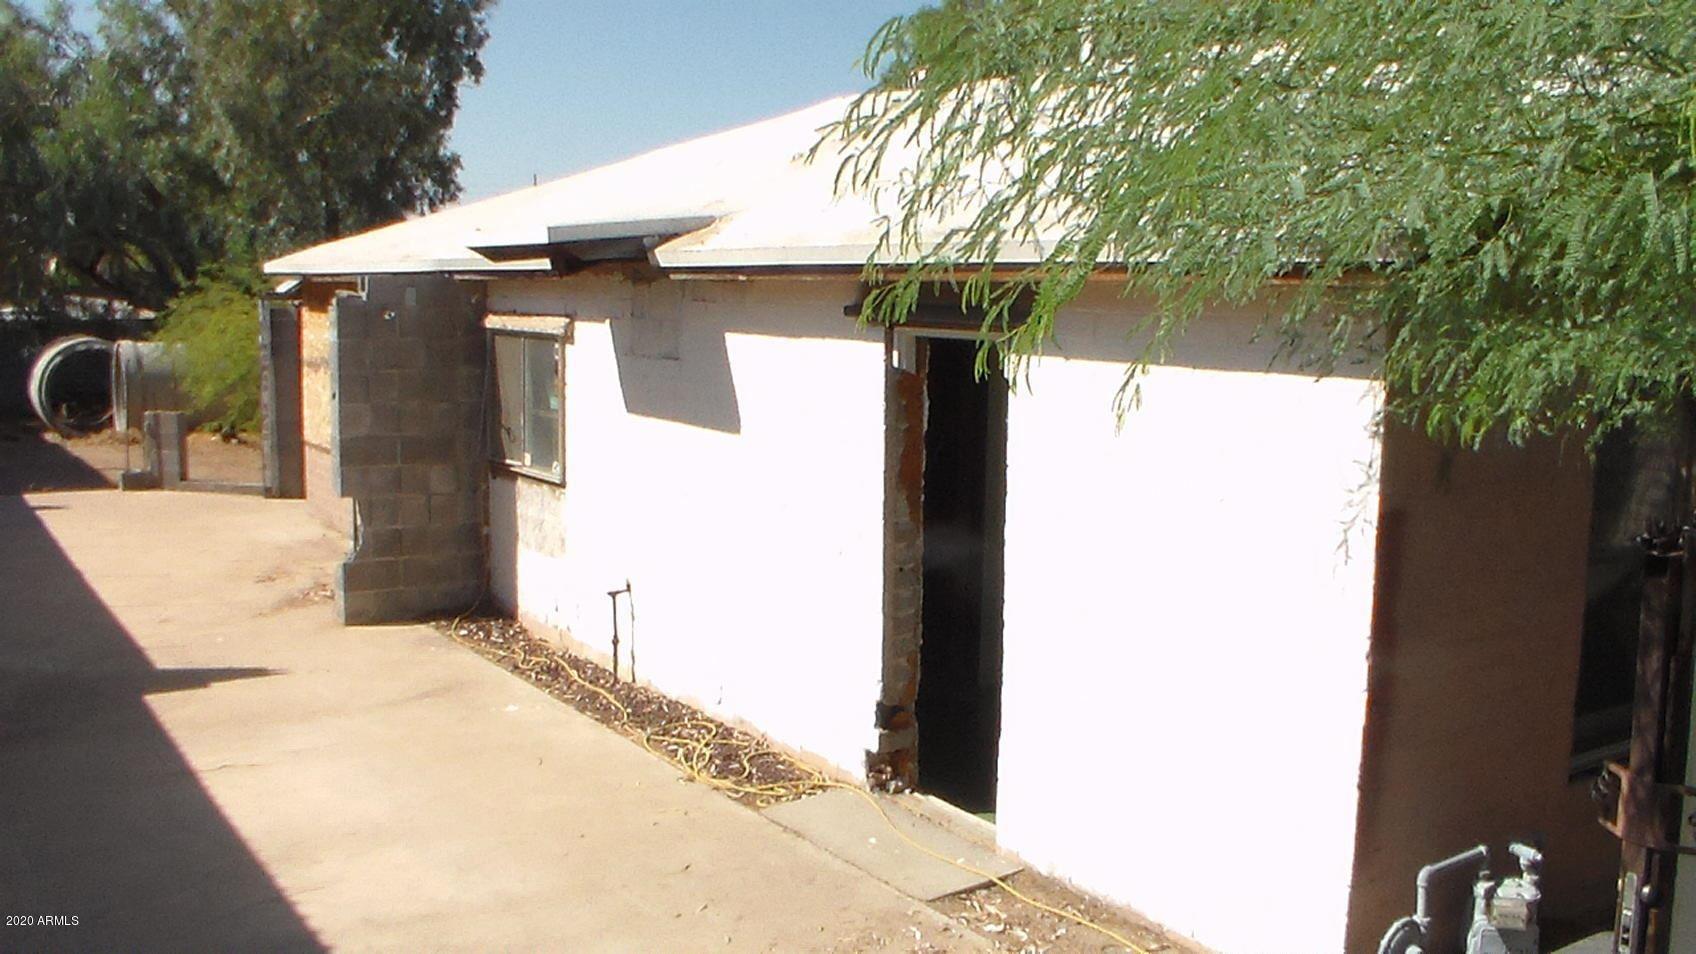 935 W VOGEL Avenue, Phoenix, AZ 85021 - MLS#: 6105065